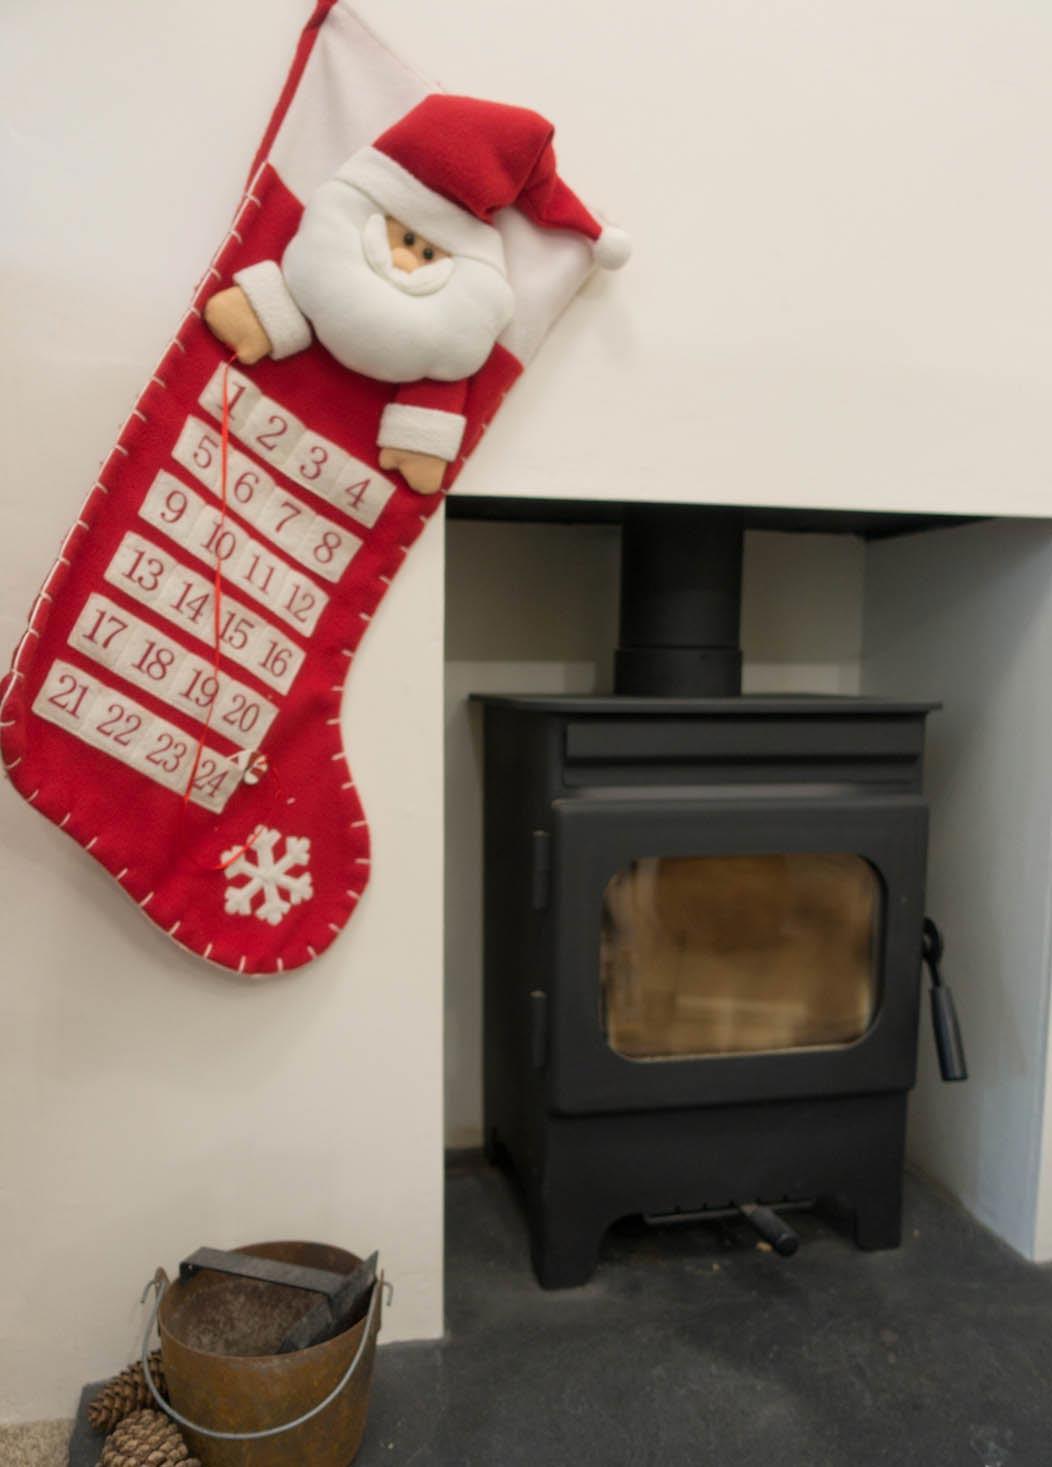 Advent calendar stocking and fireplace on Falcondalelife.com blog